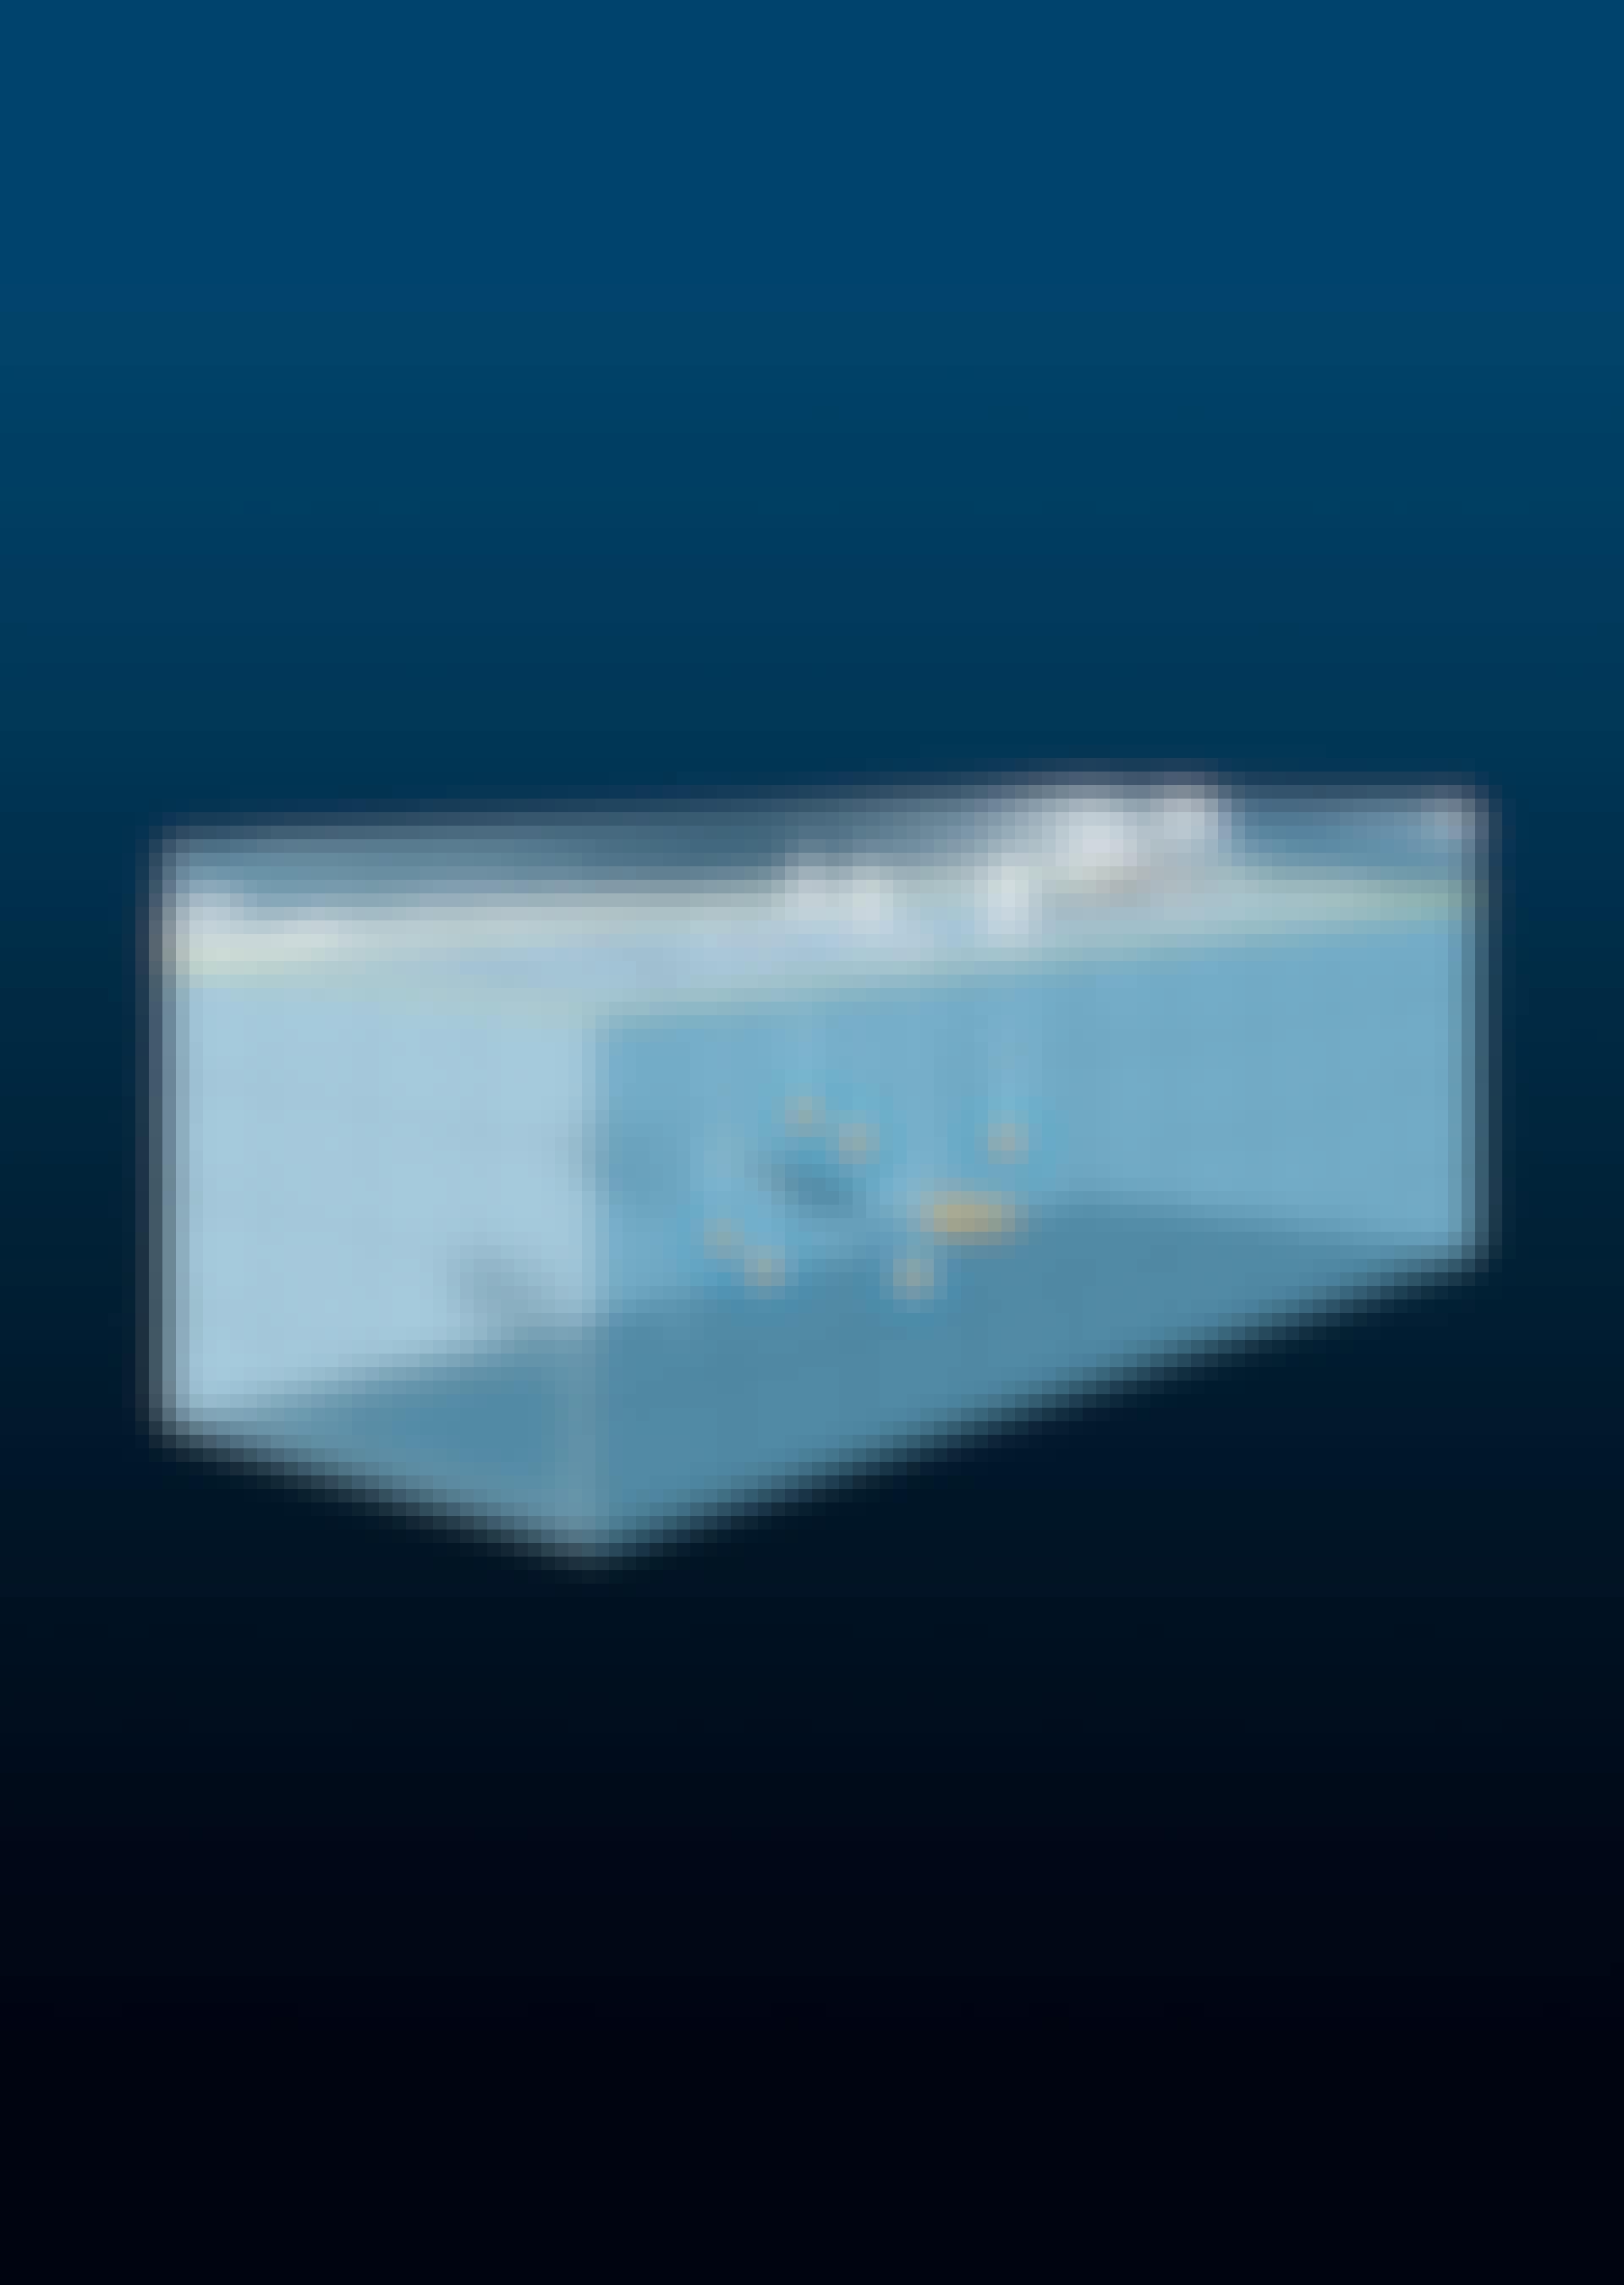 Dybvandsbombe WW2 Ubåd